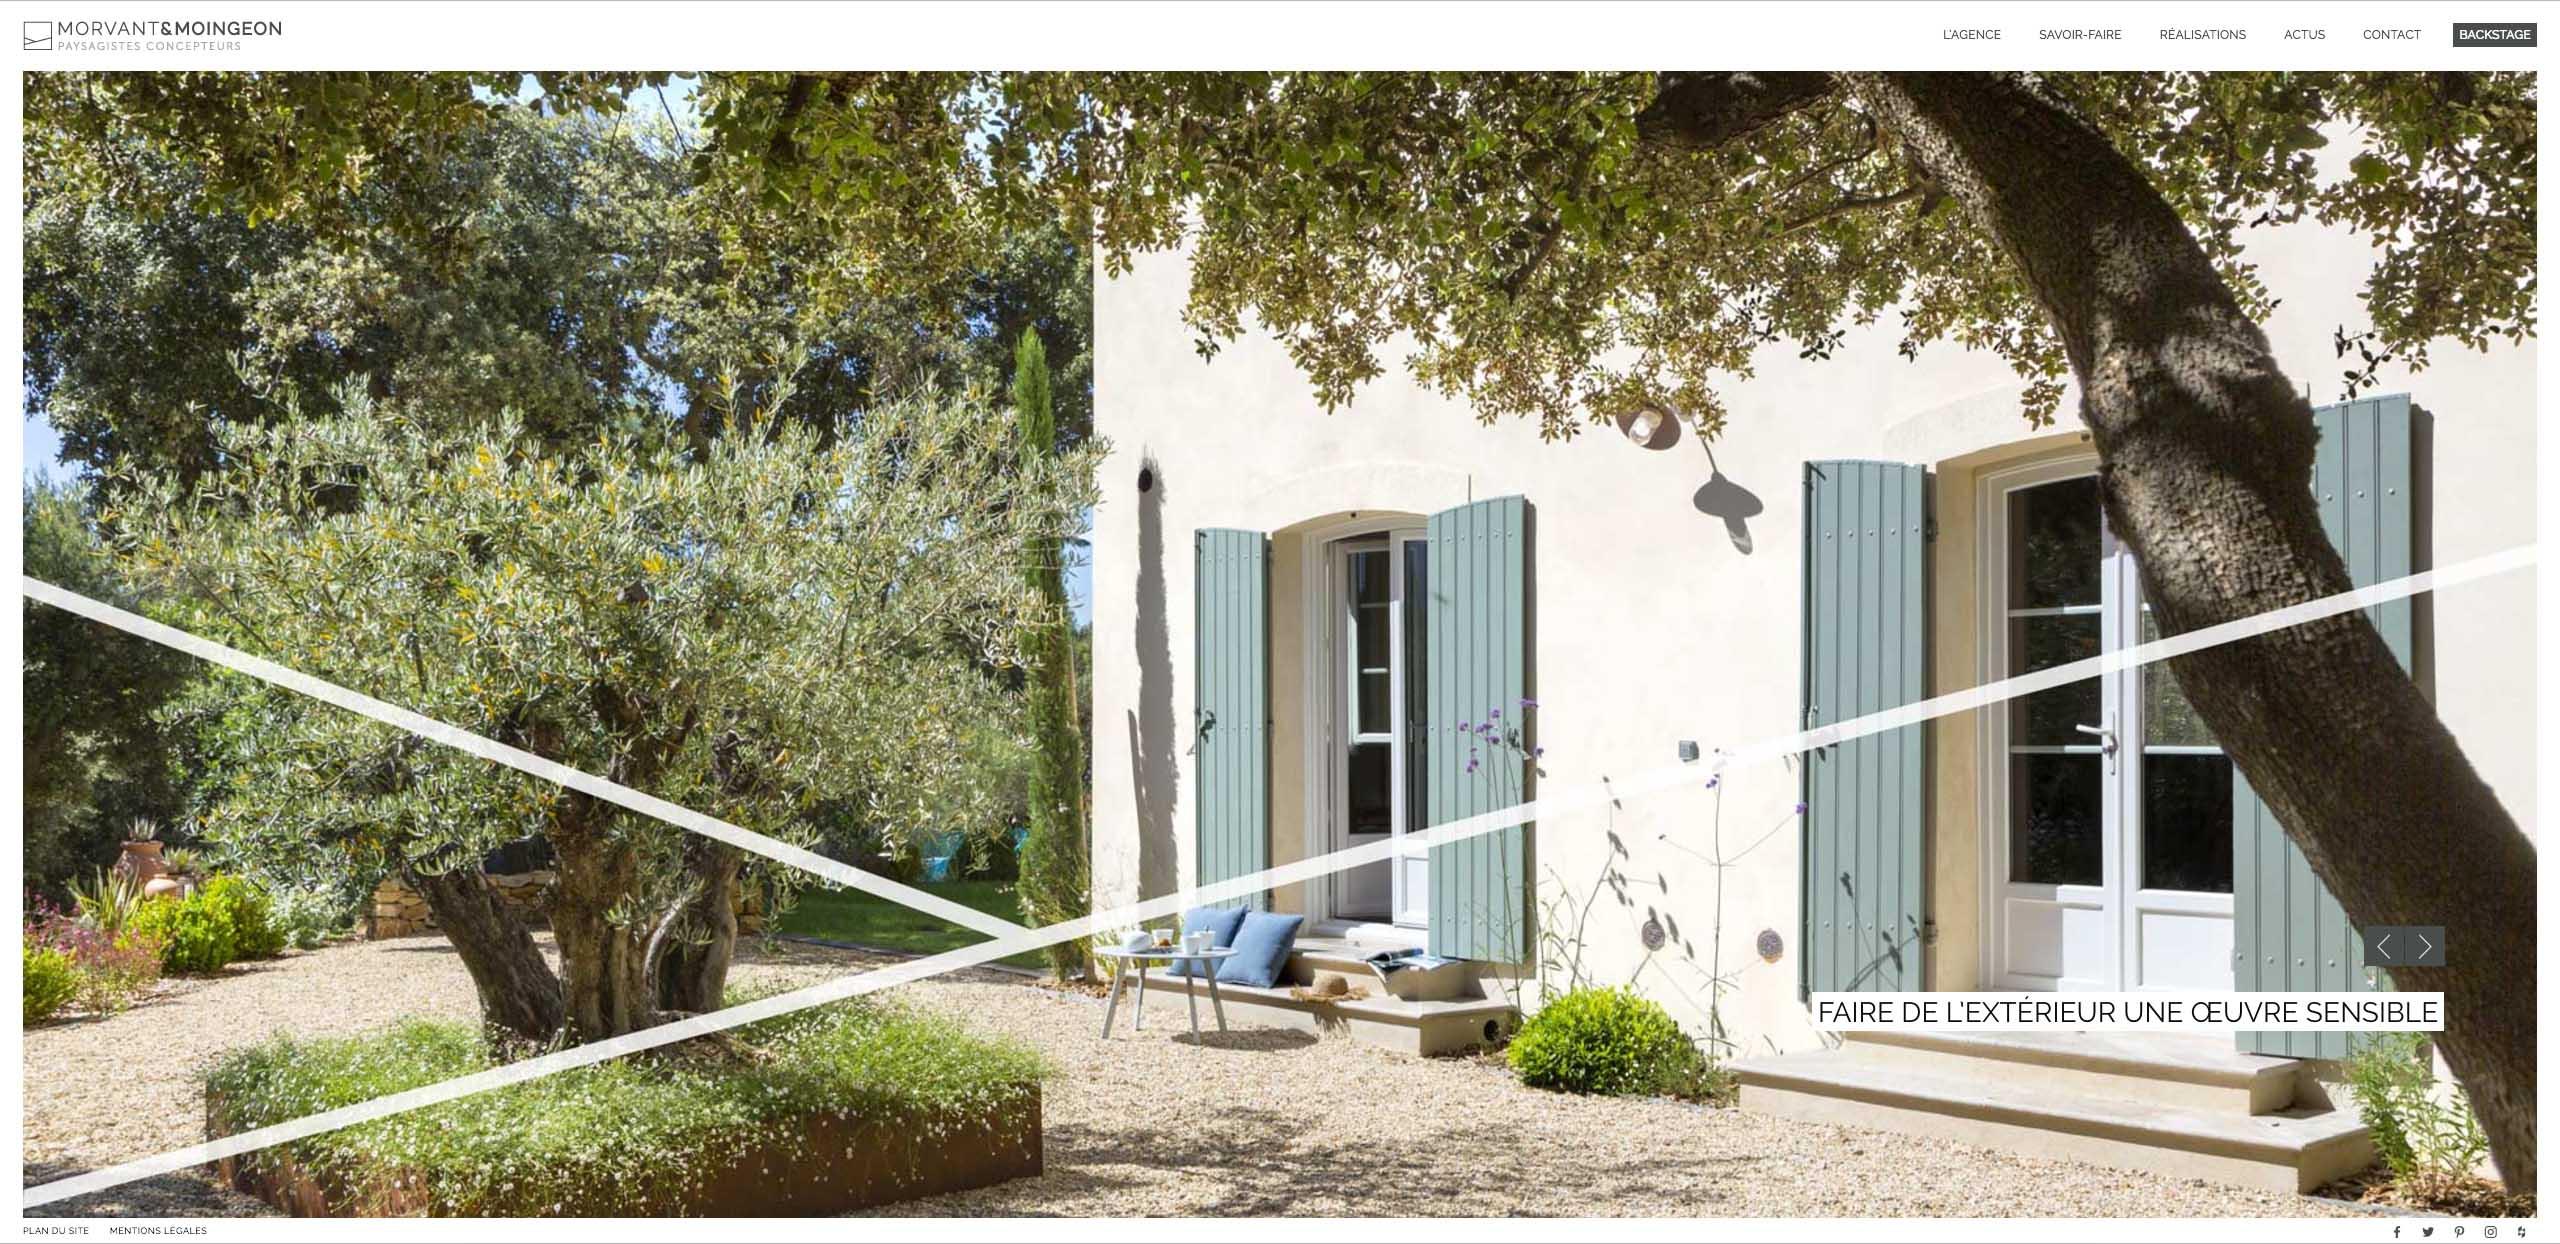 agence morvant moingeon architecte paysagiste aix en provence. Black Bedroom Furniture Sets. Home Design Ideas